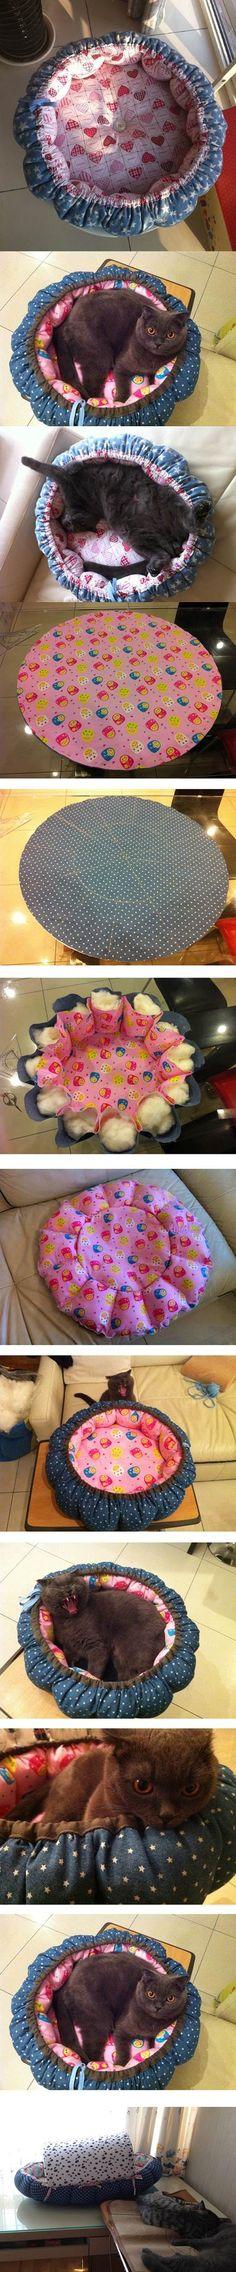 DIY Pumpkin Bed for Cats ~